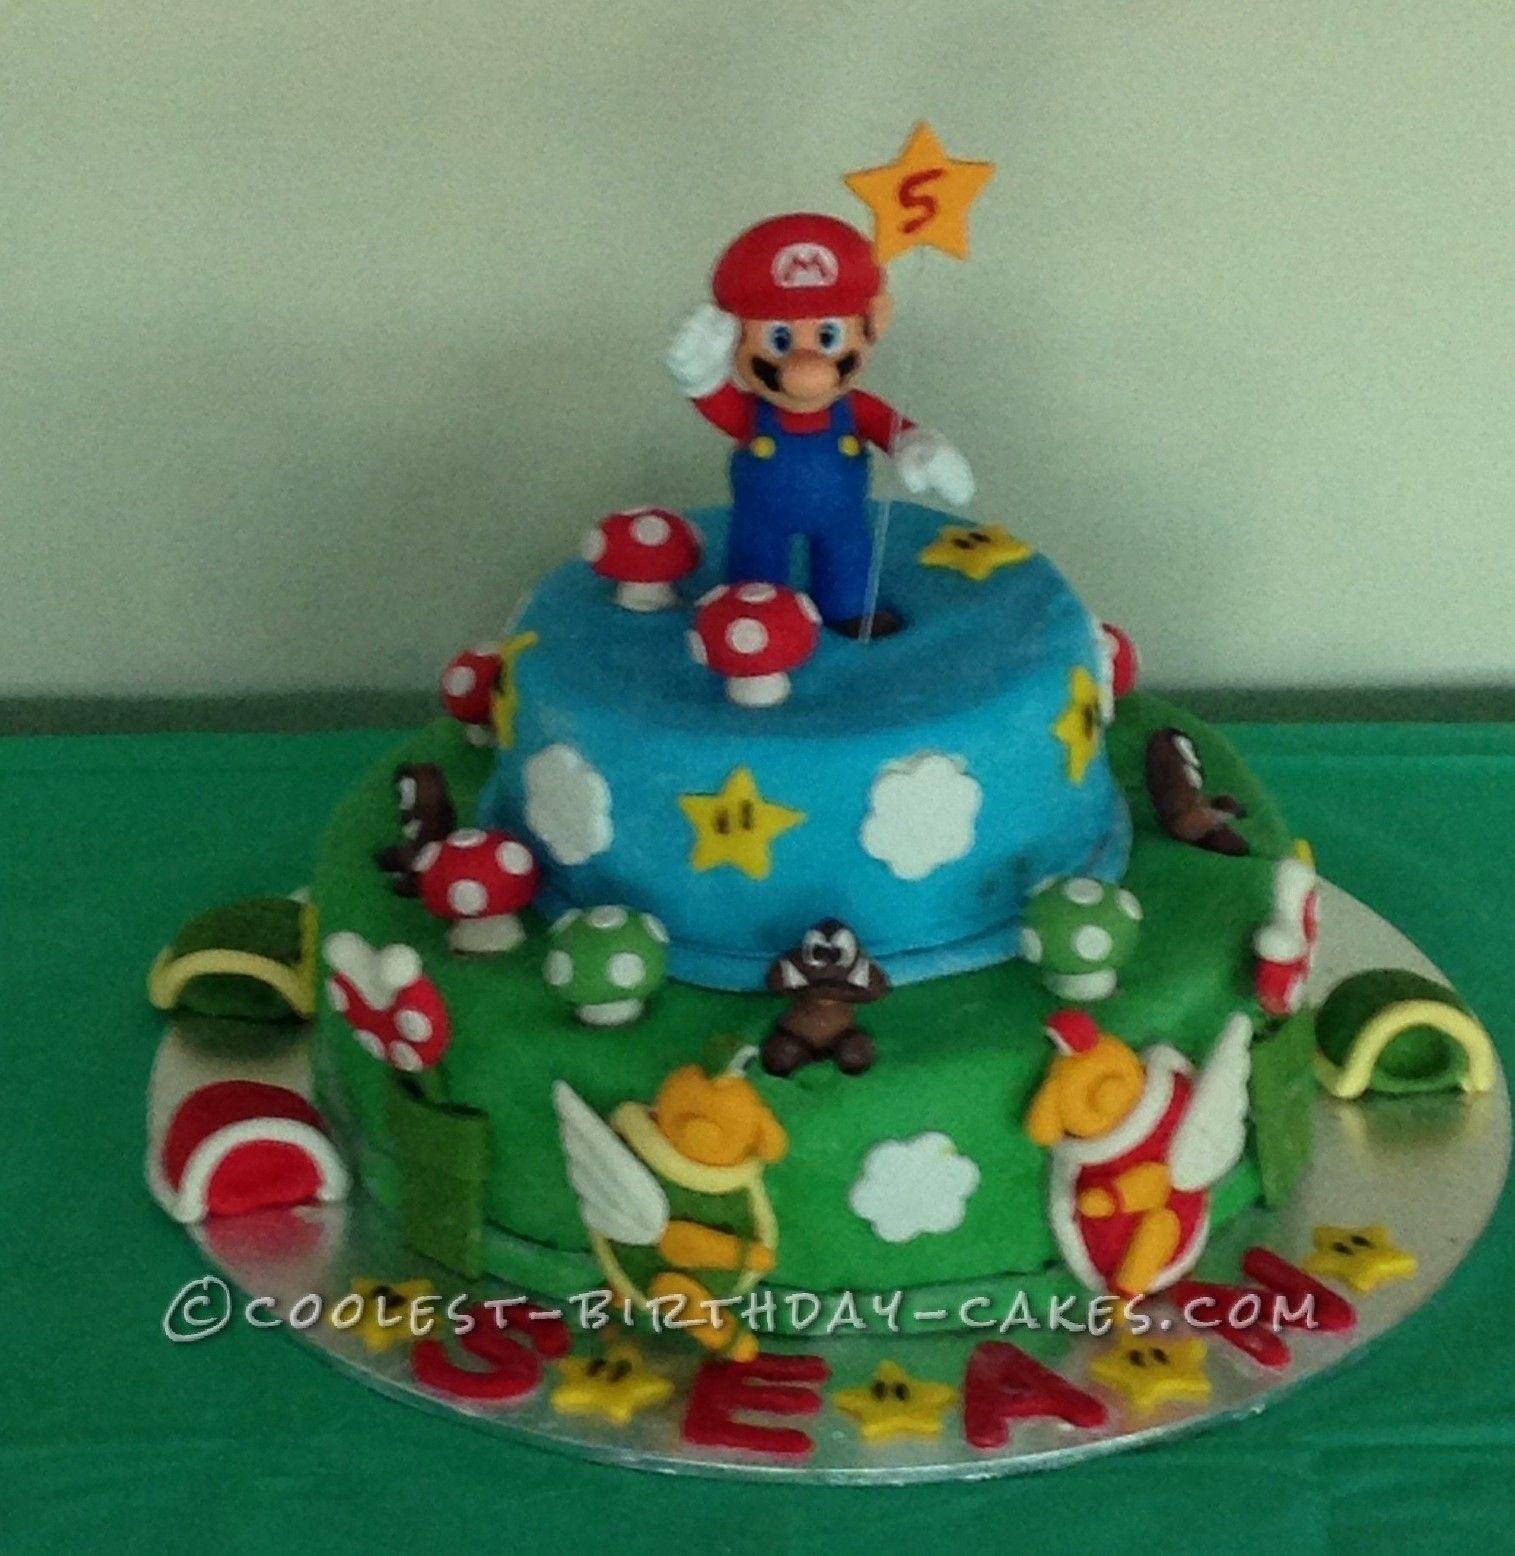 Coolest Super Mario Birthday Cake